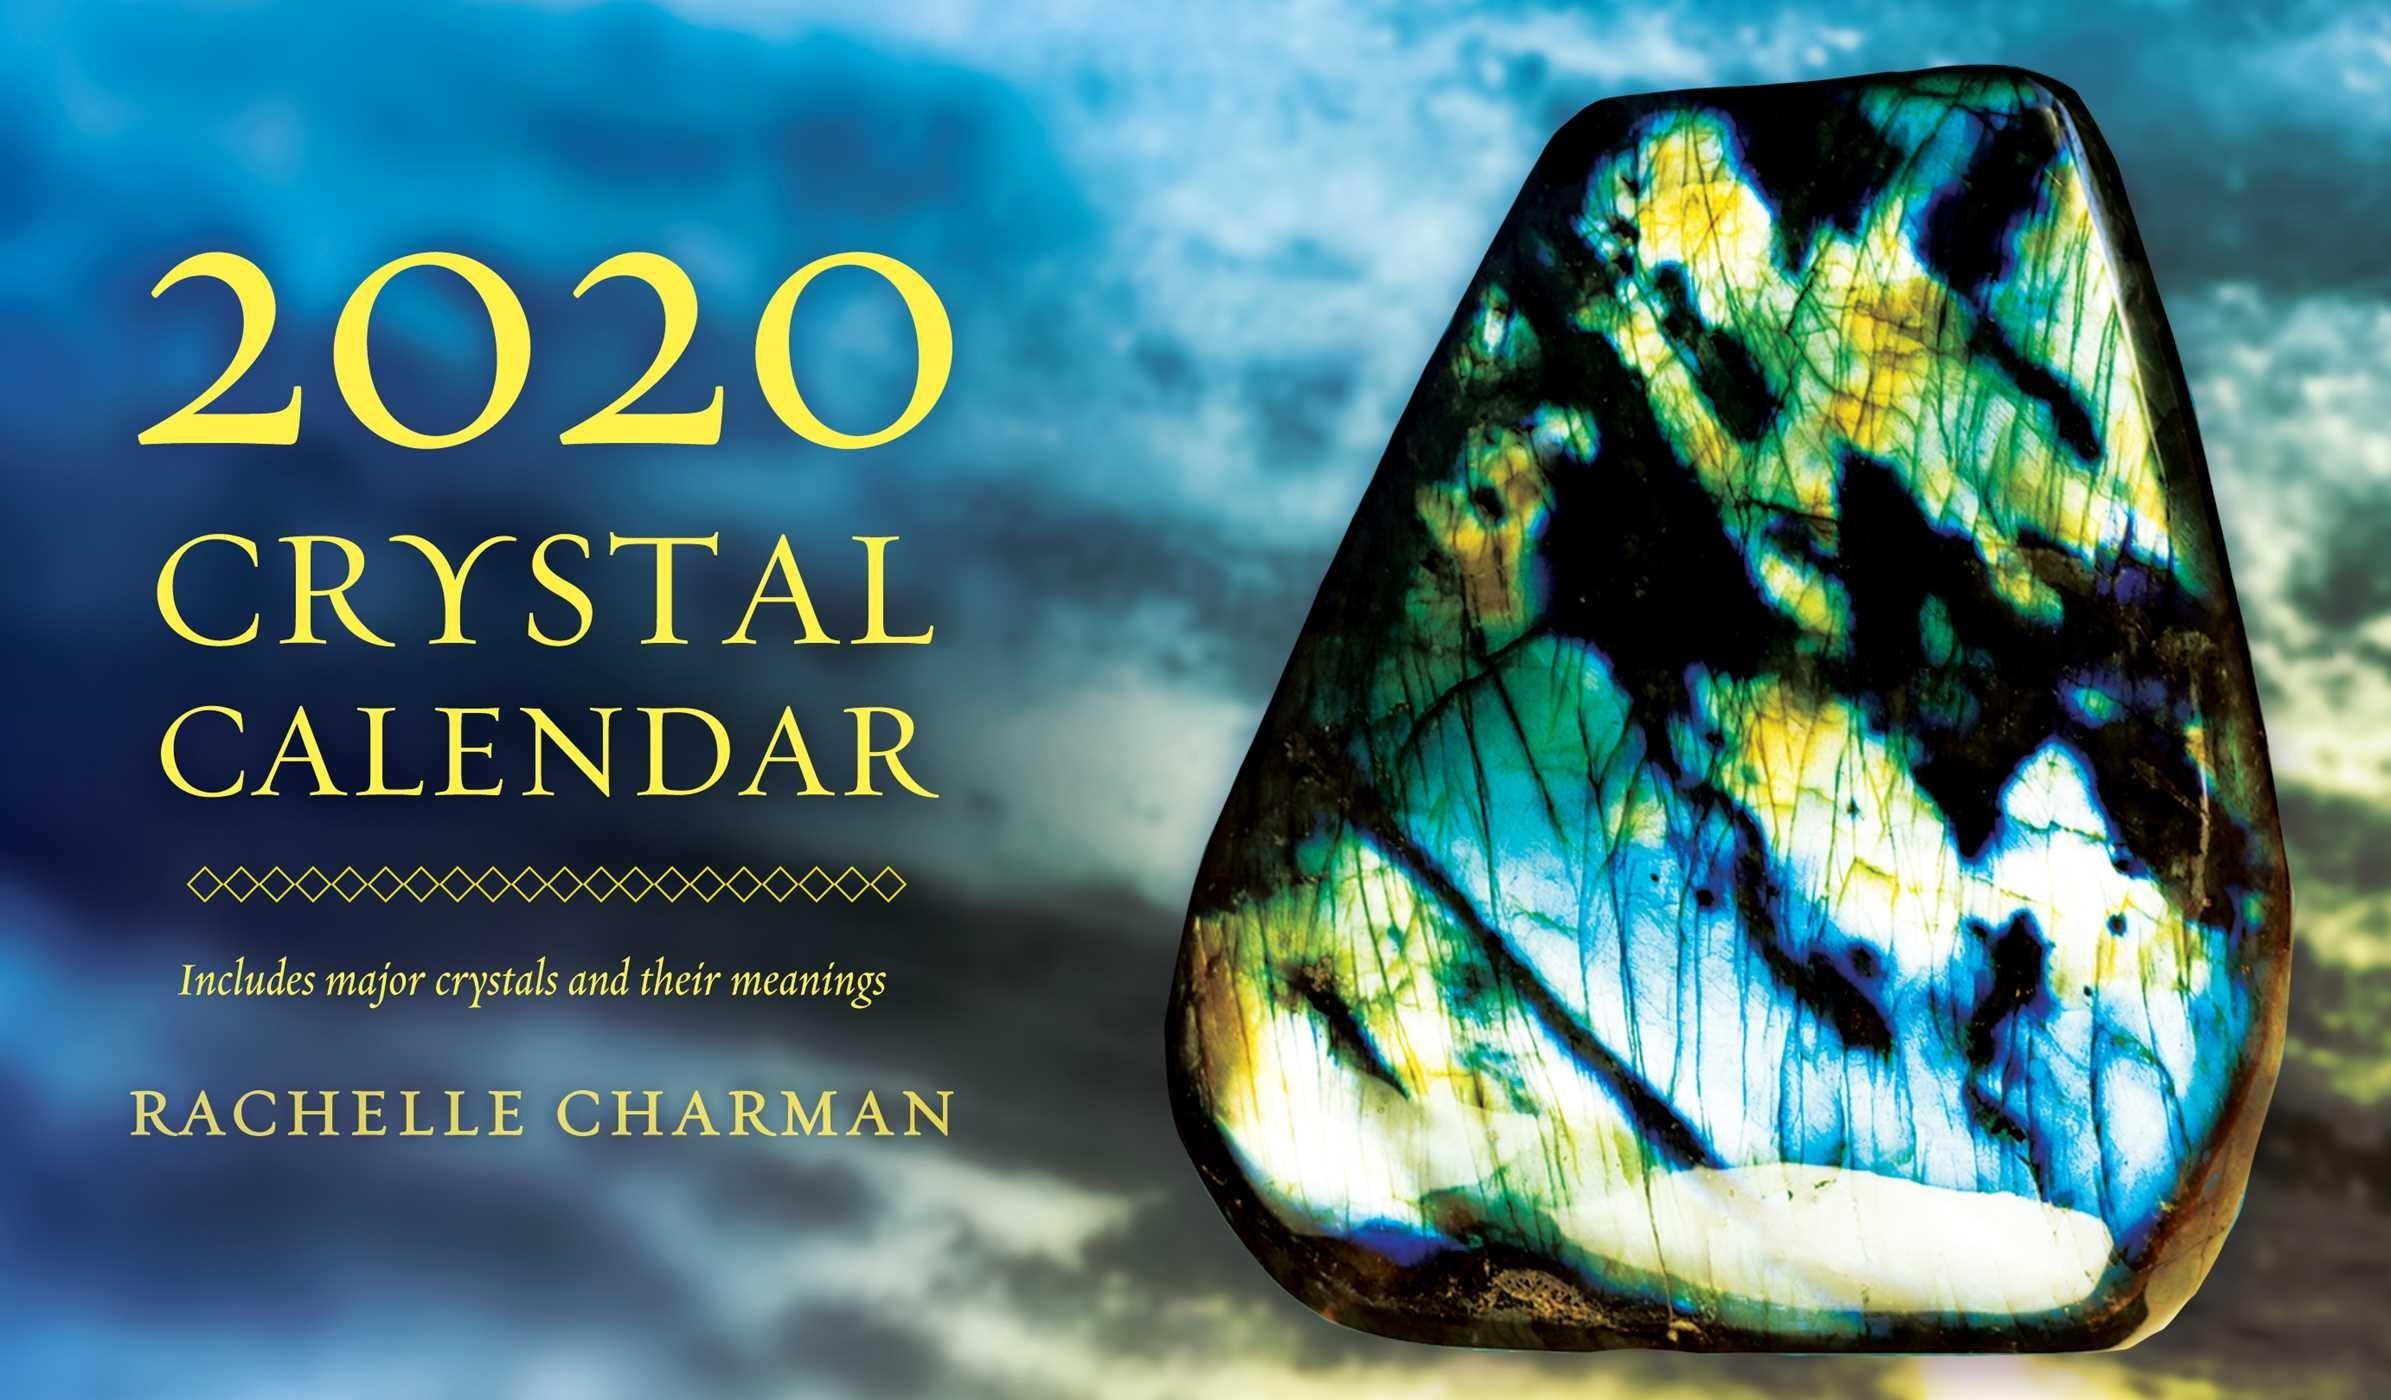 2020 Crystal Calendar - Book Summary & Video | Official